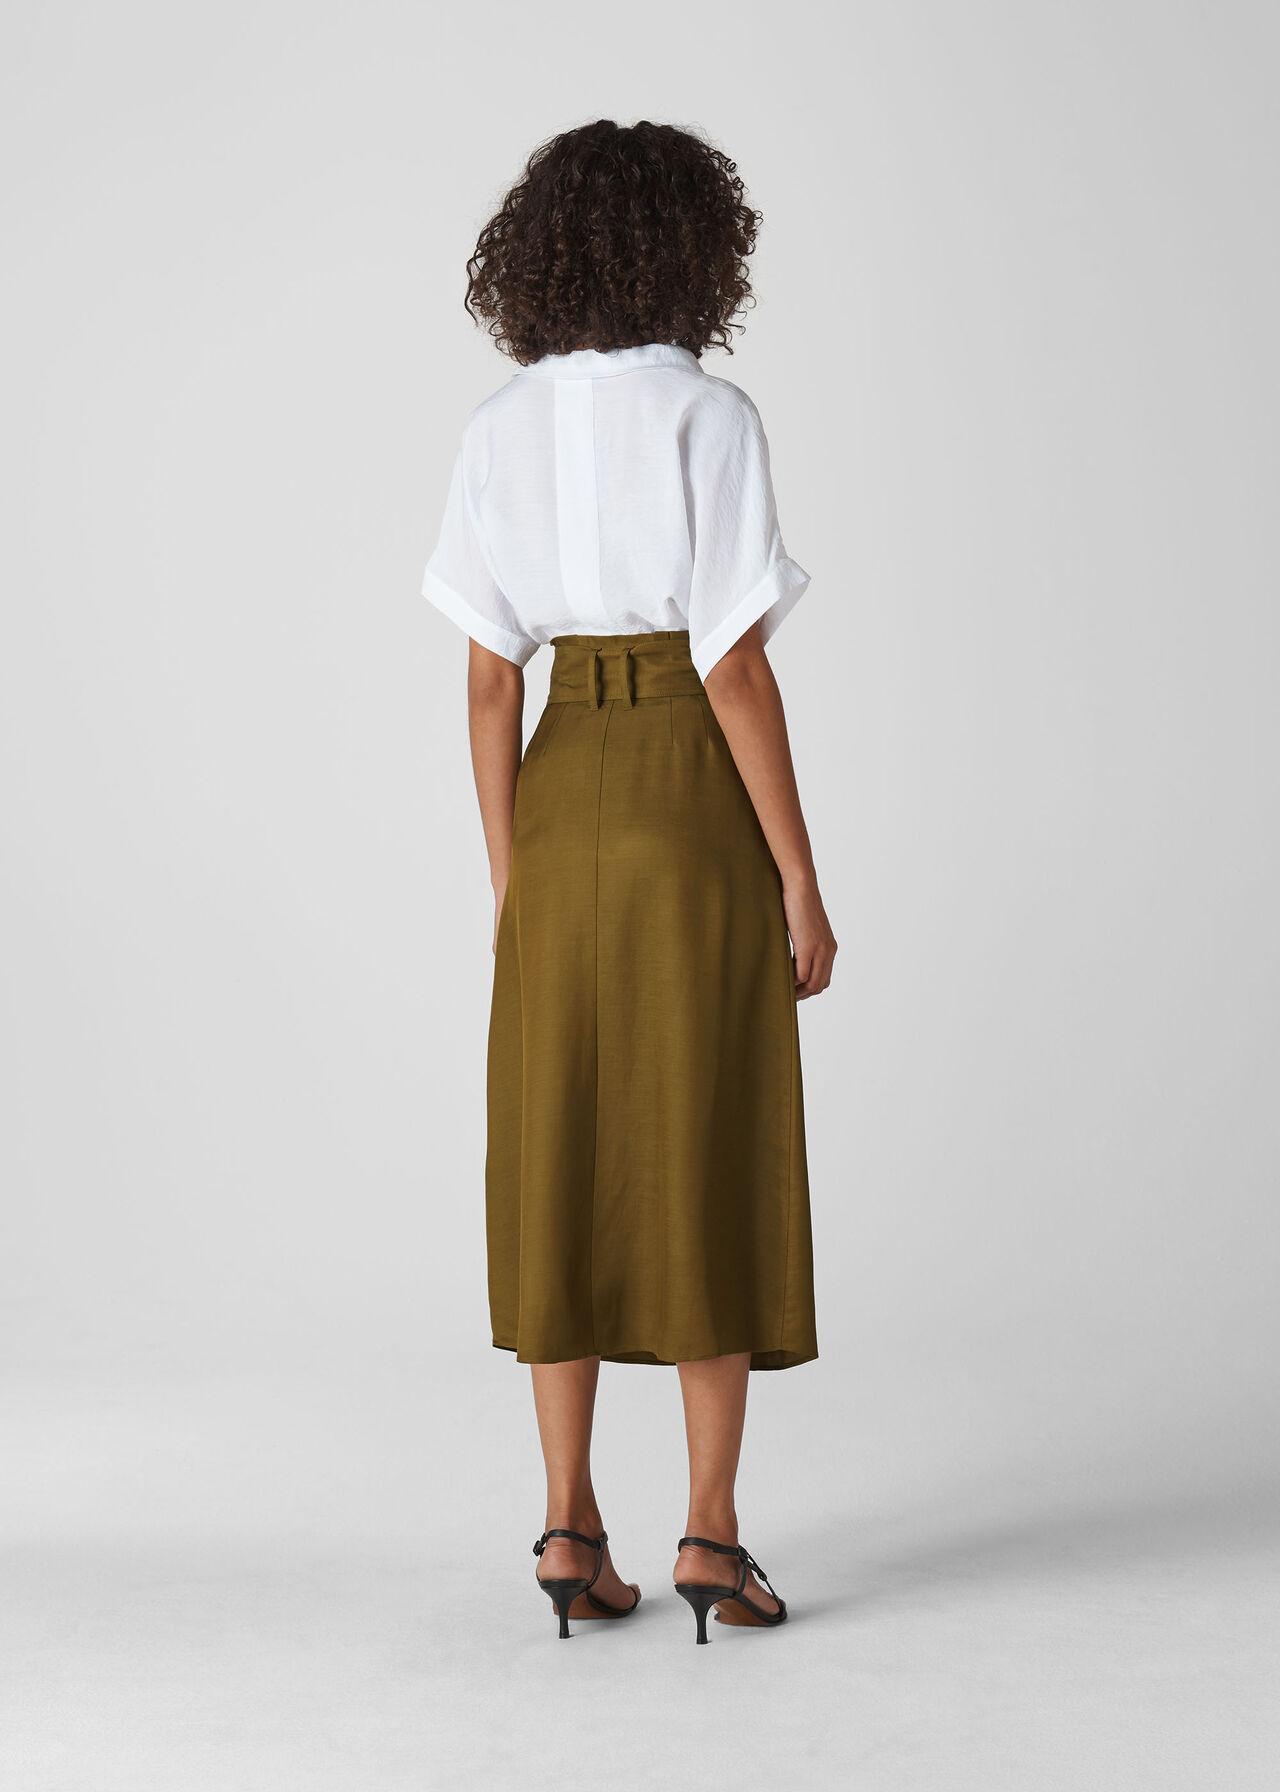 Rosita Buckle Skirt Khaki